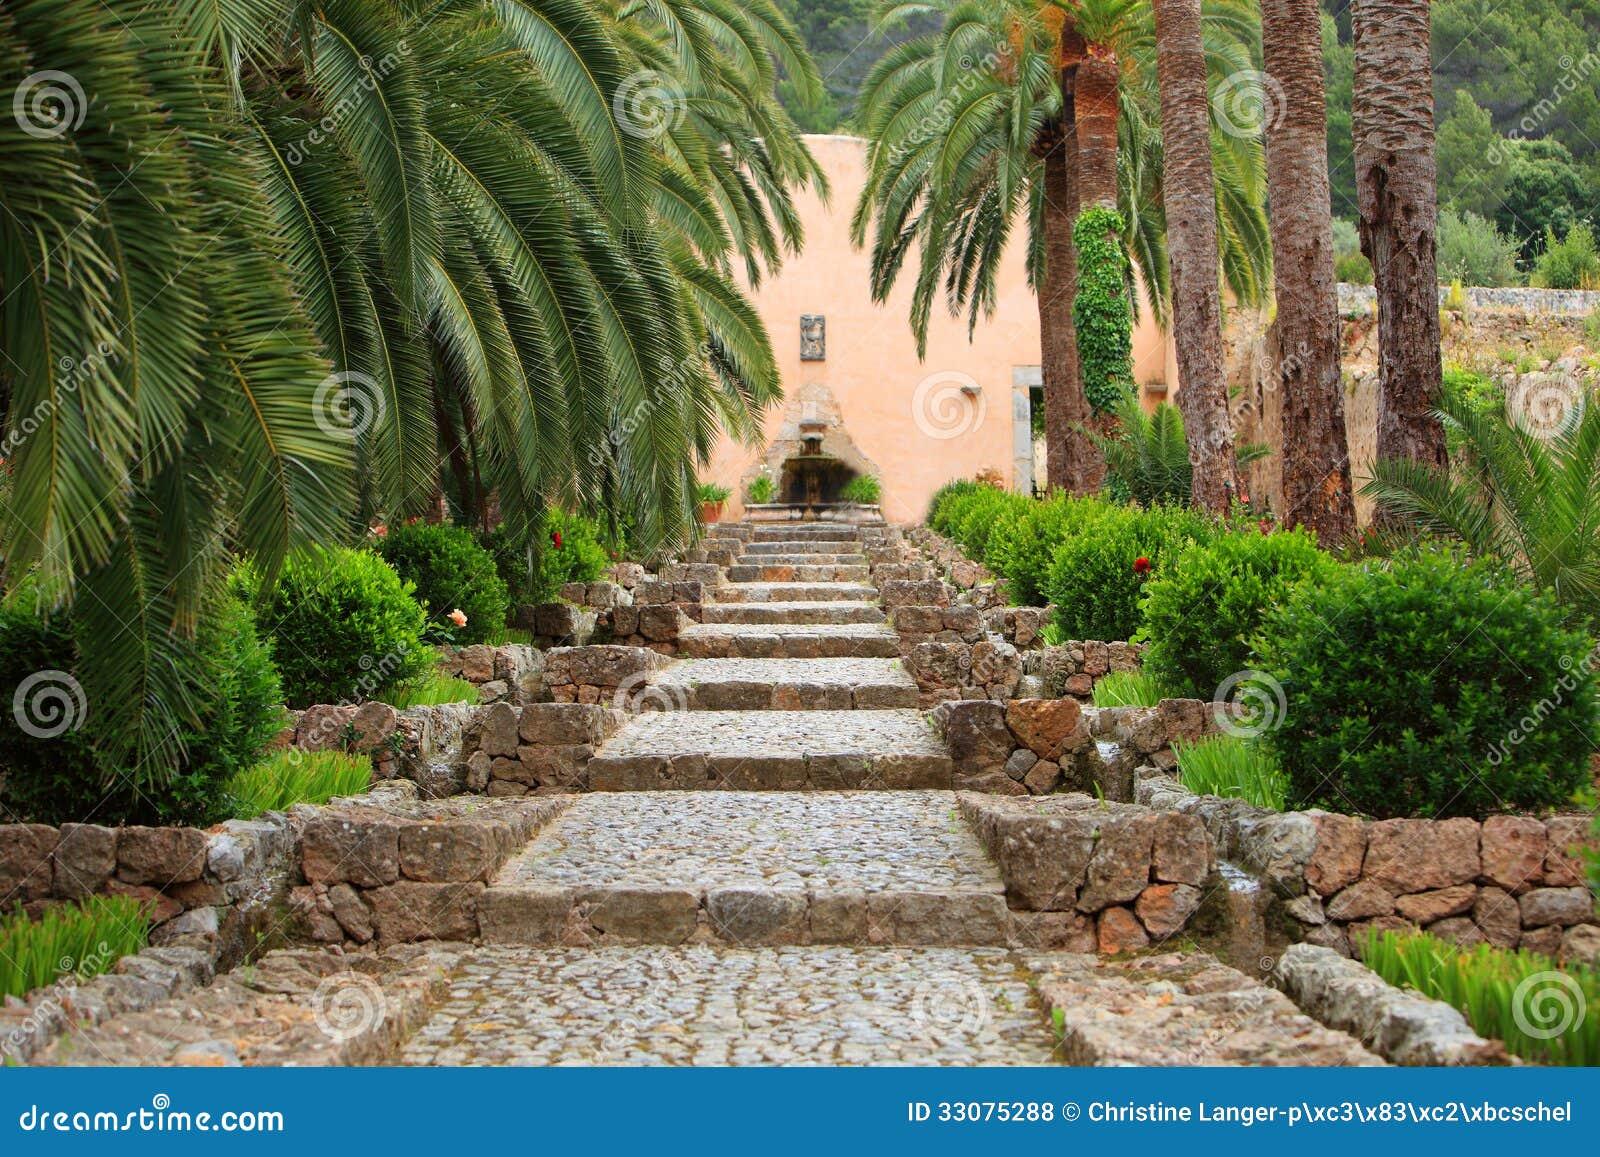 Straight Garden Walkway With Cobblestones Royalty Free